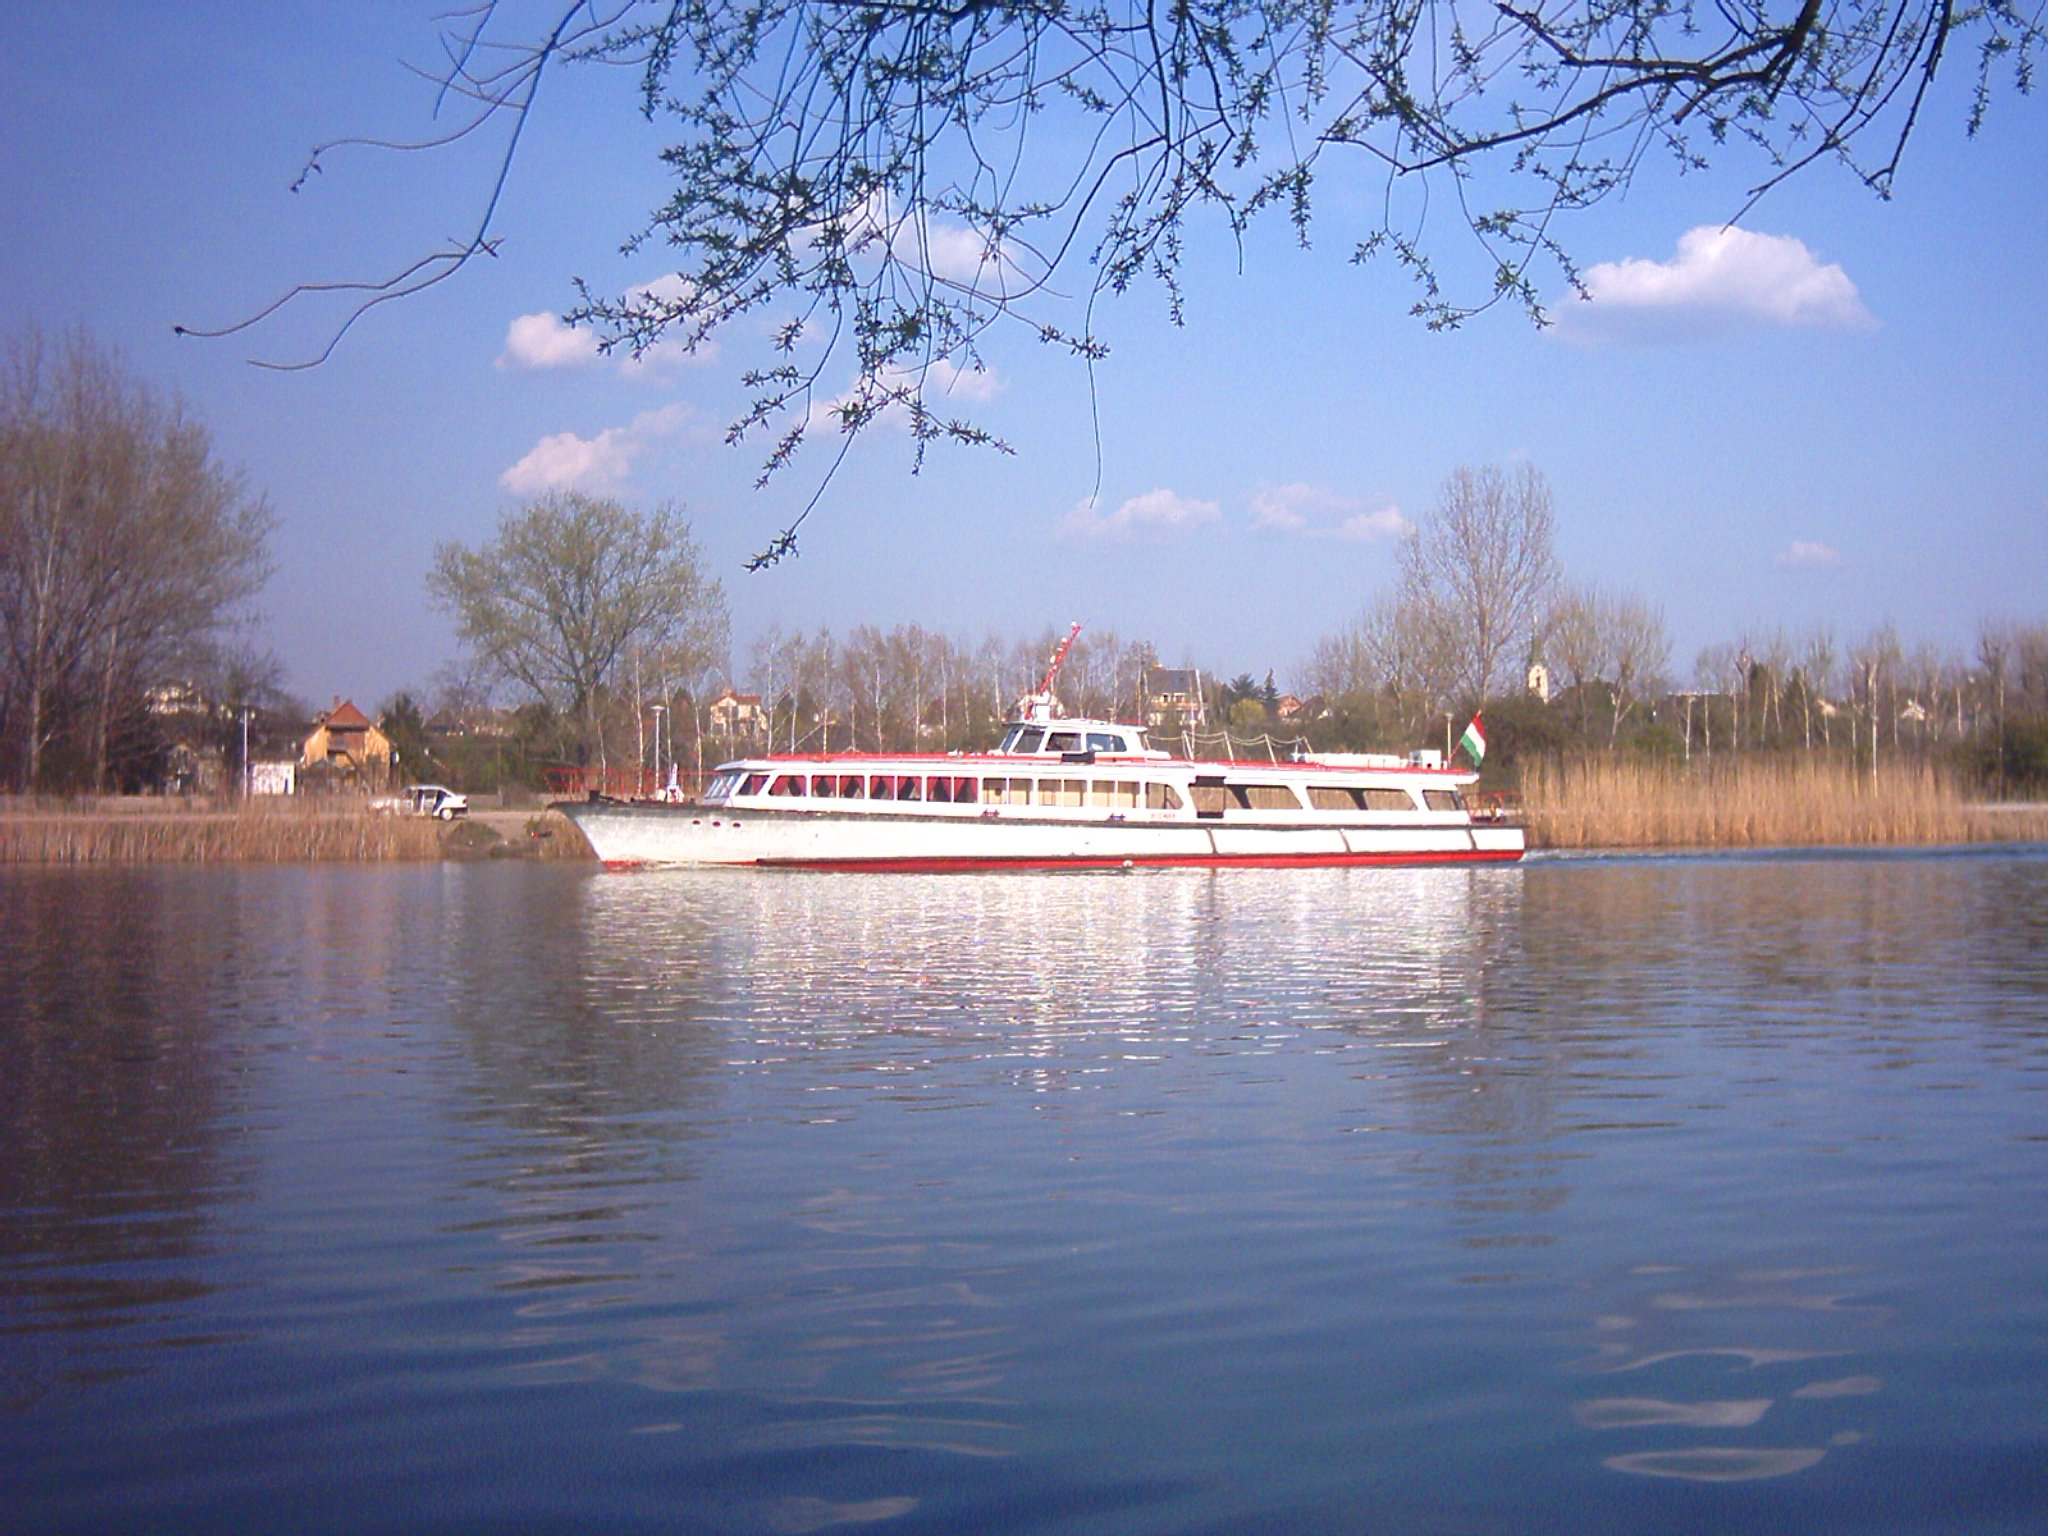 http://www.kisdunainagyhajok.hu/setahajok_vizibuszok_kirandulohajok/2007_03_31_budavar_vizibusz_a_molnar-szigeti_kompnal/2007_03_31_budavar_vizibusz_a_molnar-szigeti_kompnal_002.jpg